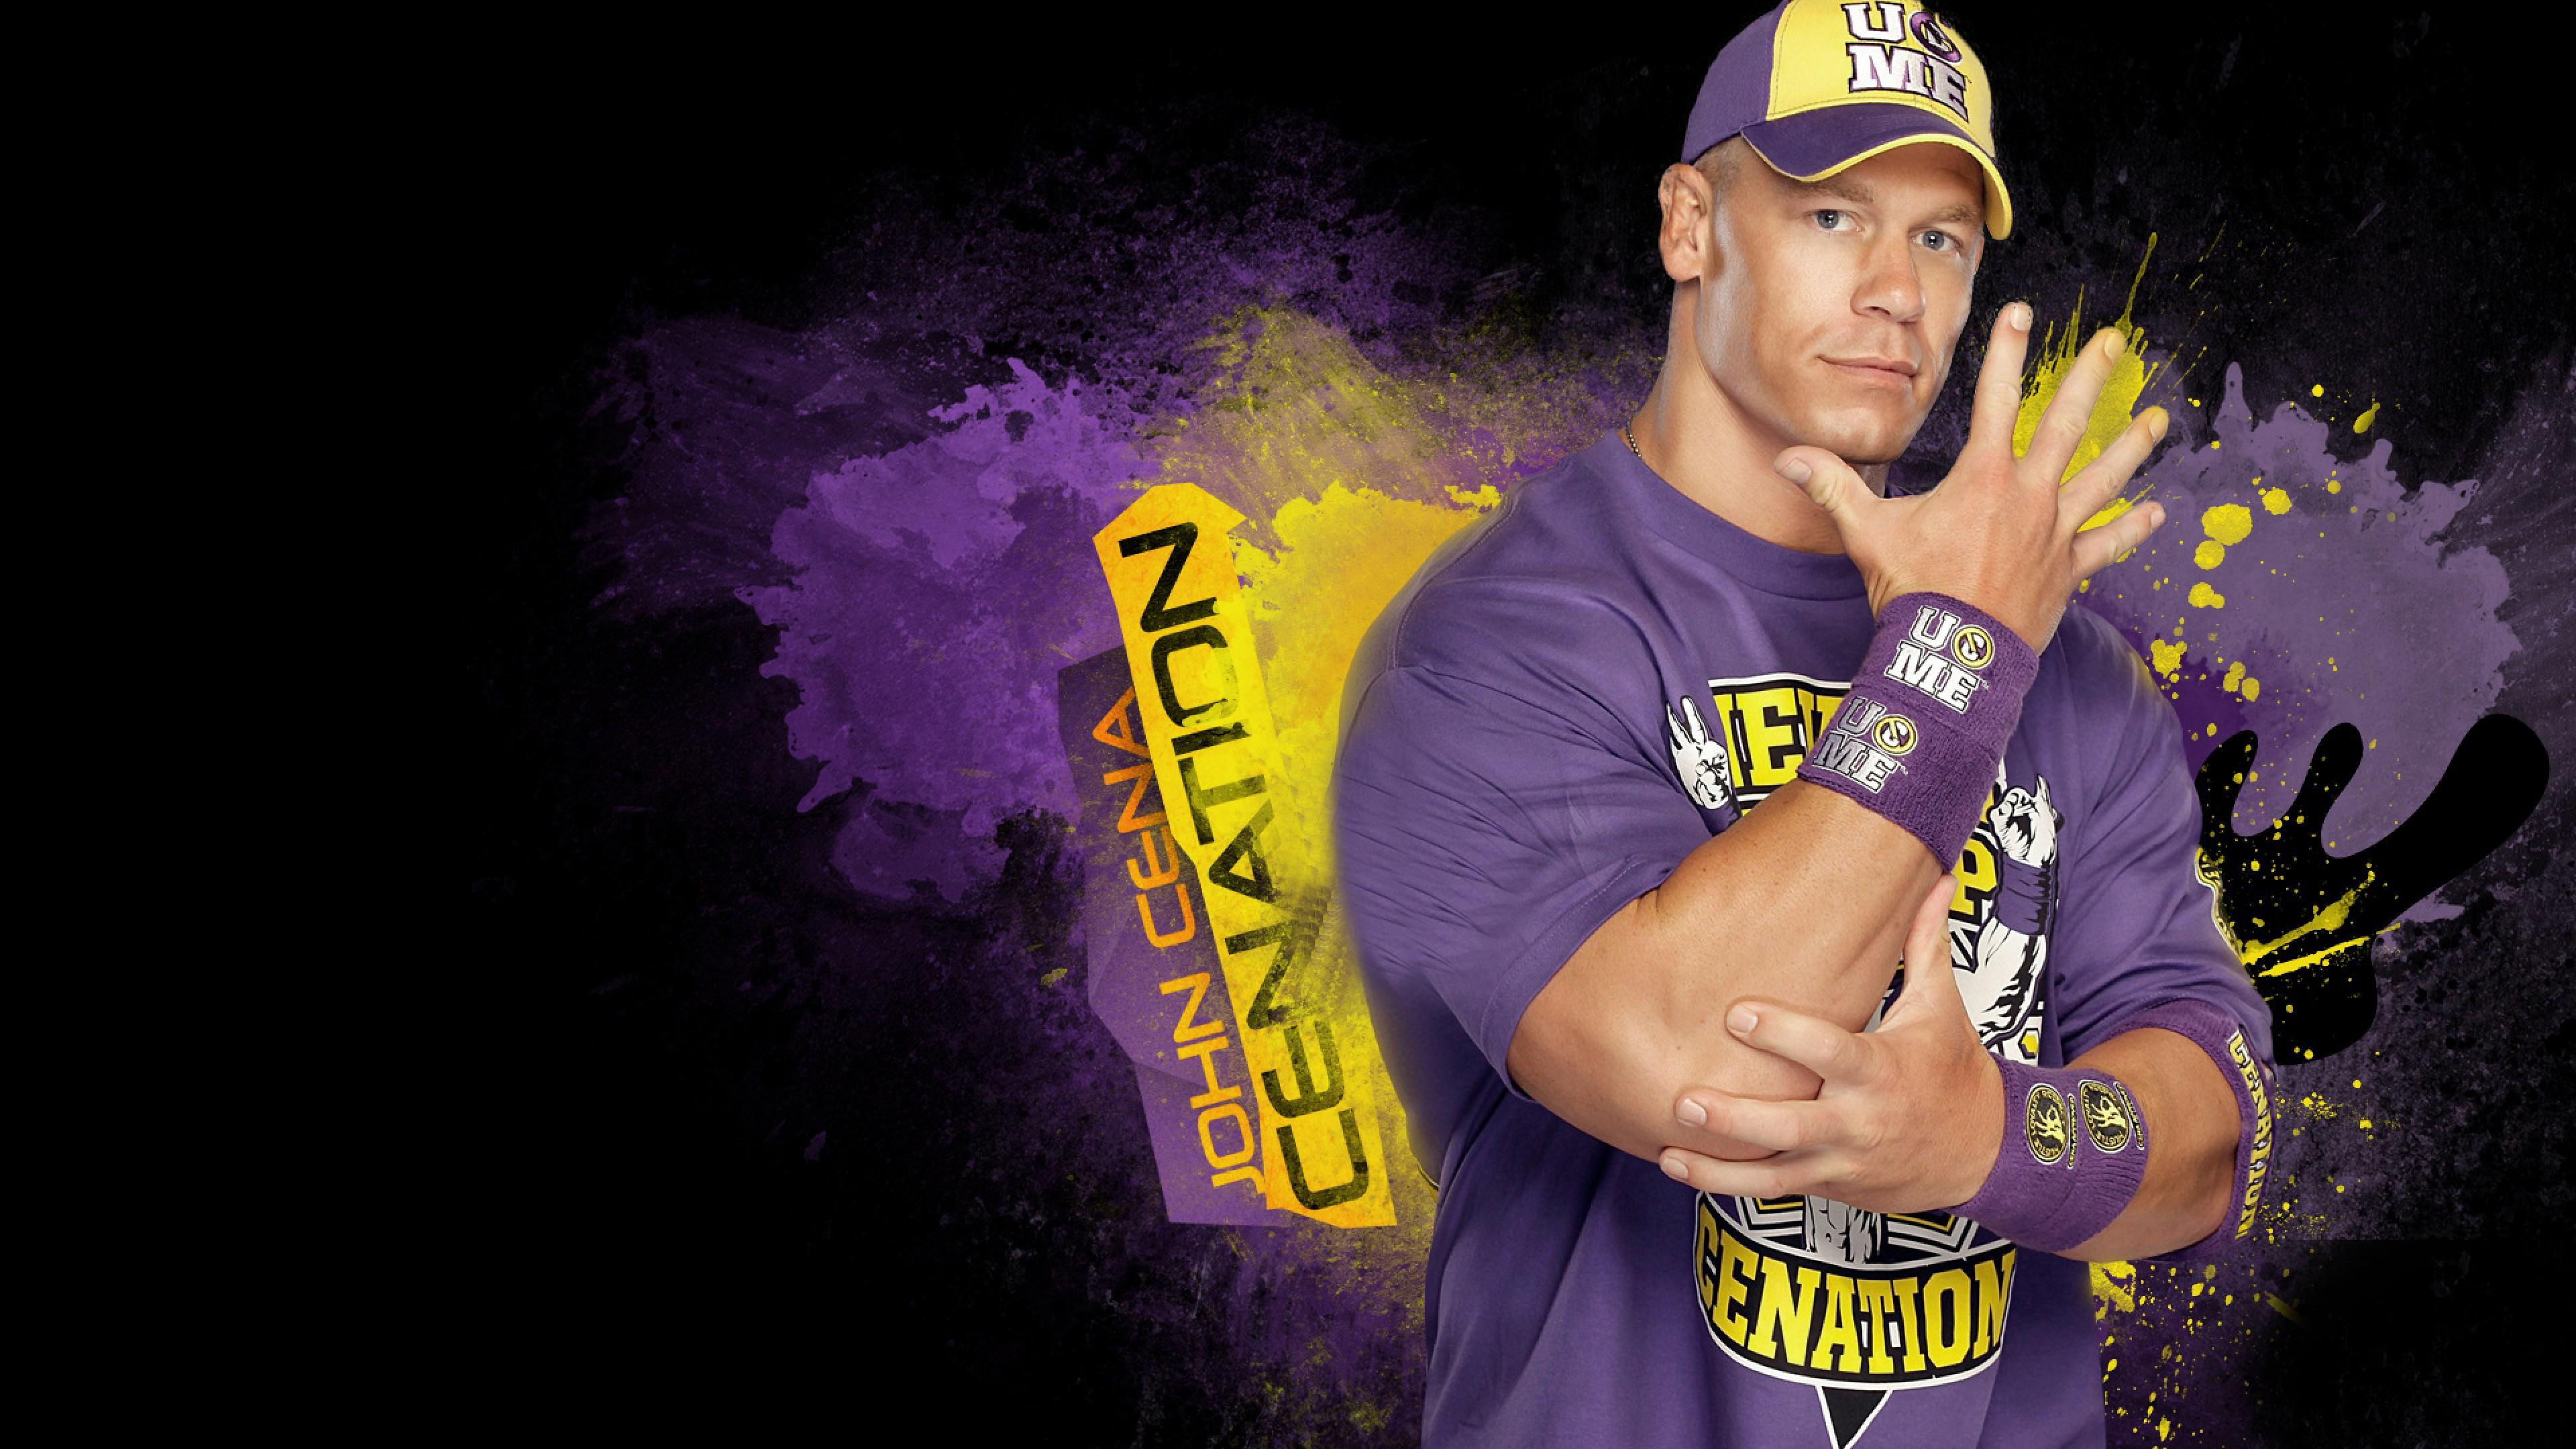 The Rock Vs John Cena Hd Wallpaper Wallpapers Trend